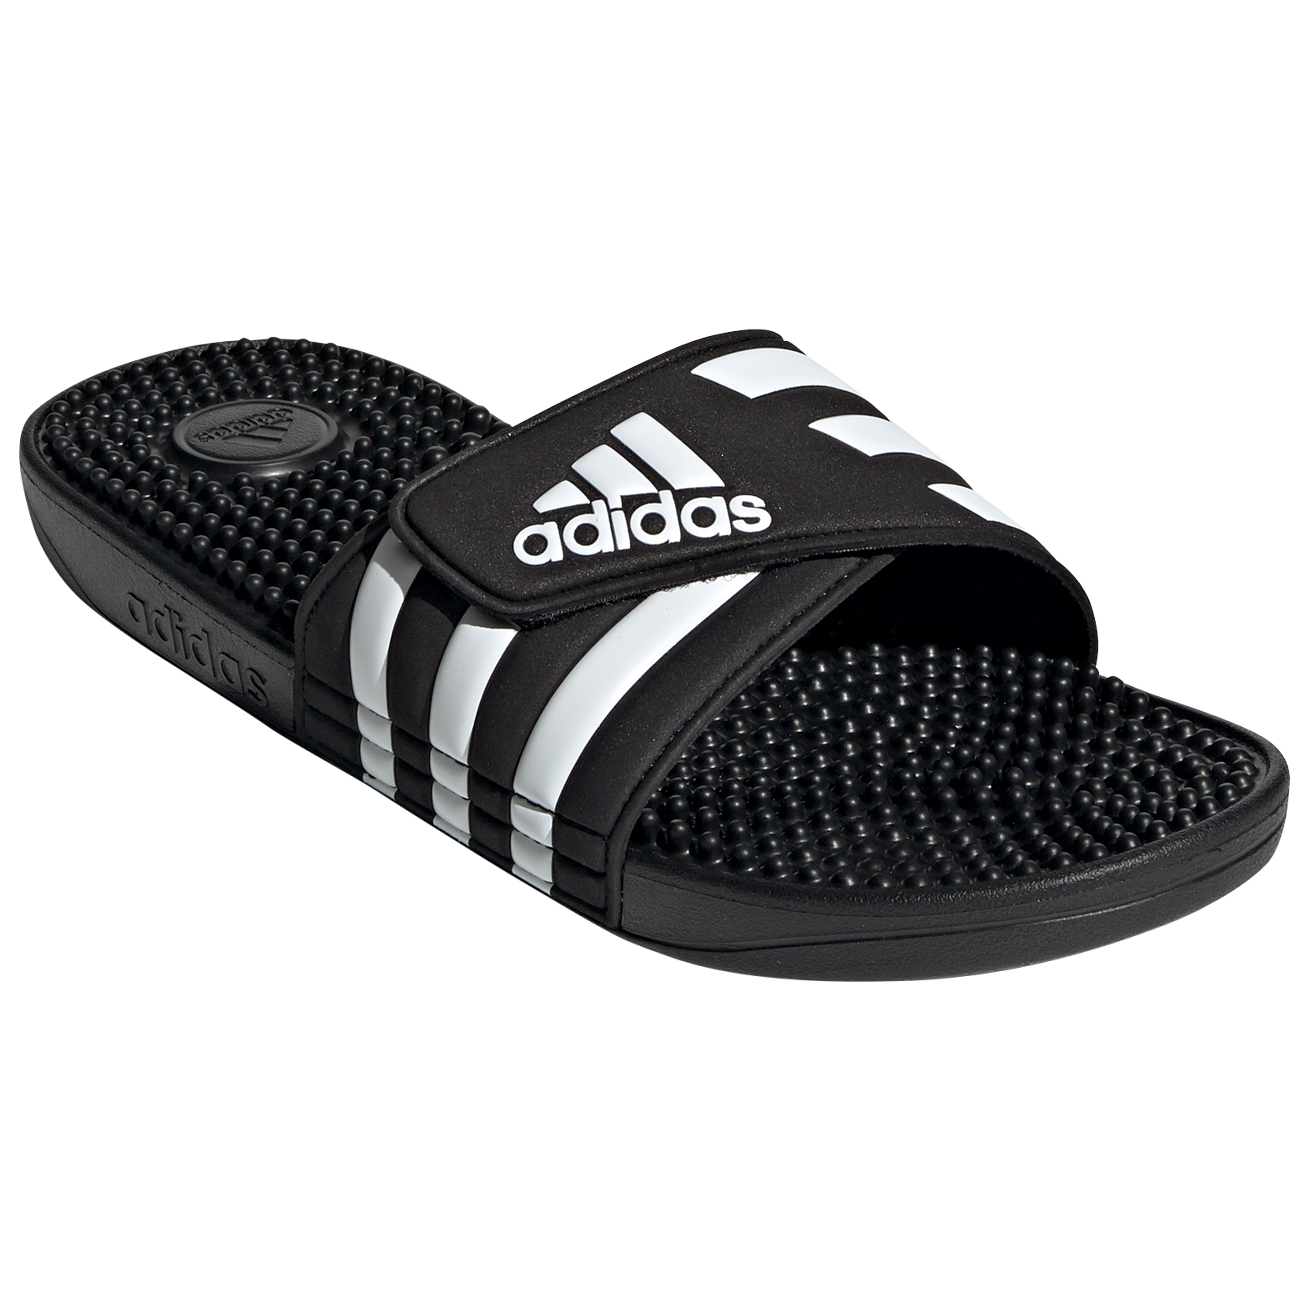 new product f0742 e7ab1 Adidas Adissage - Sandales Homme  Achat en ligne  Alpiniste.